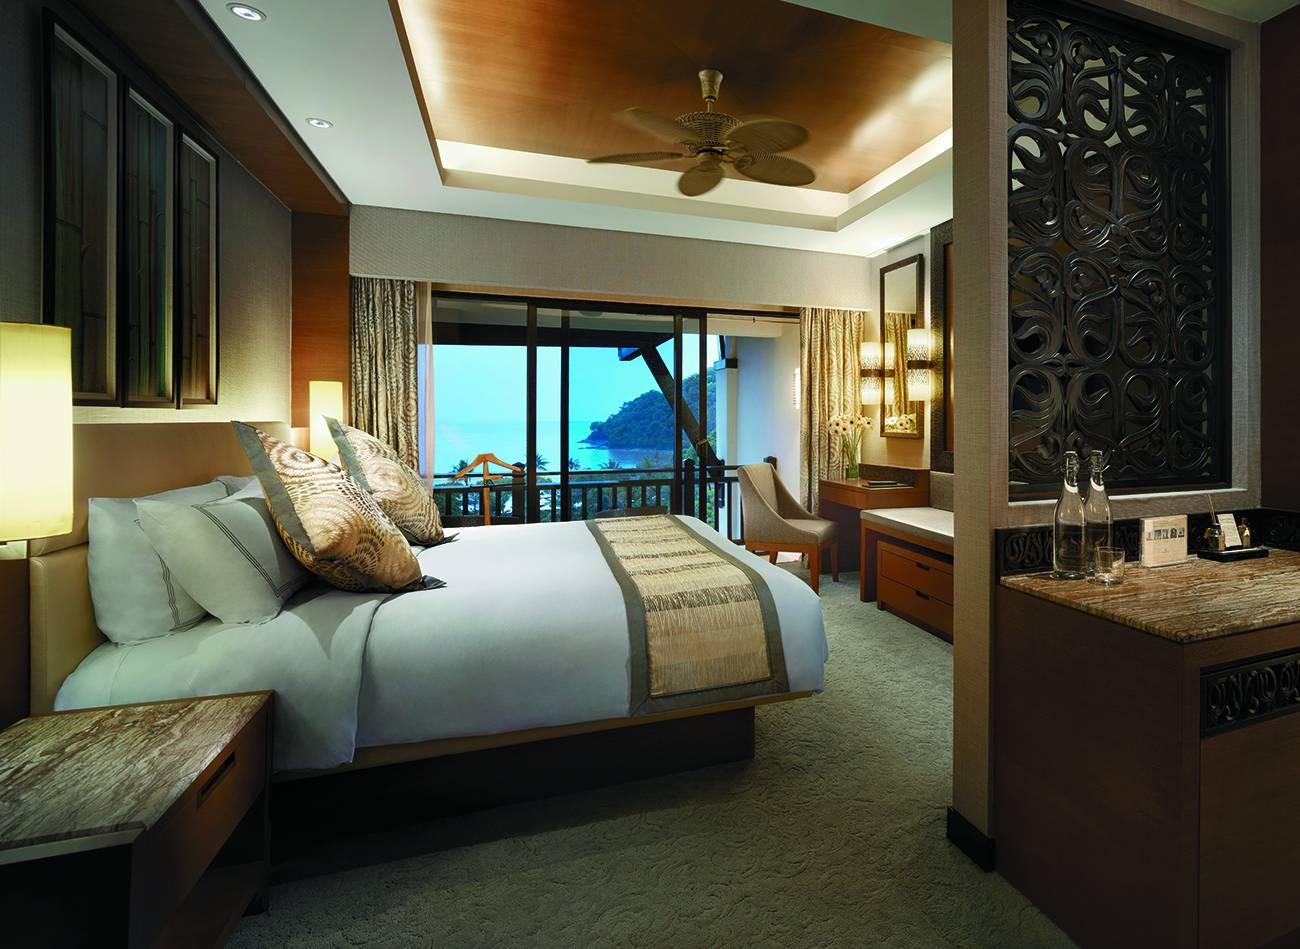 Shangri la Rasa Ria Resort and Spa Kota Kinabalu Sabah Malaysia honeymoon halal